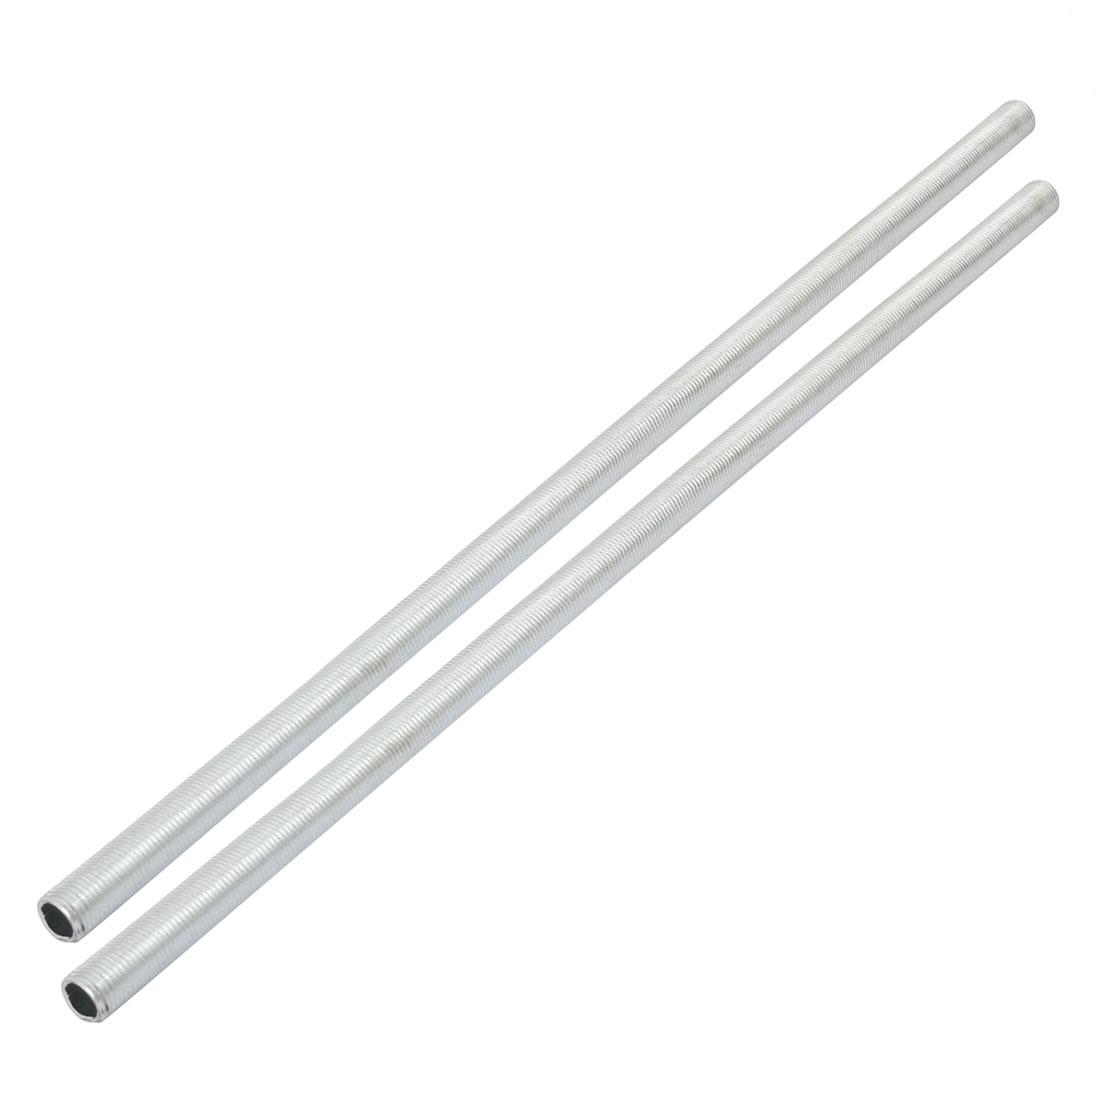 2pcs Metric M10 1mm Pitch Thread Zinc Plated Pipe Nipple Lamp Parts 33cm Long